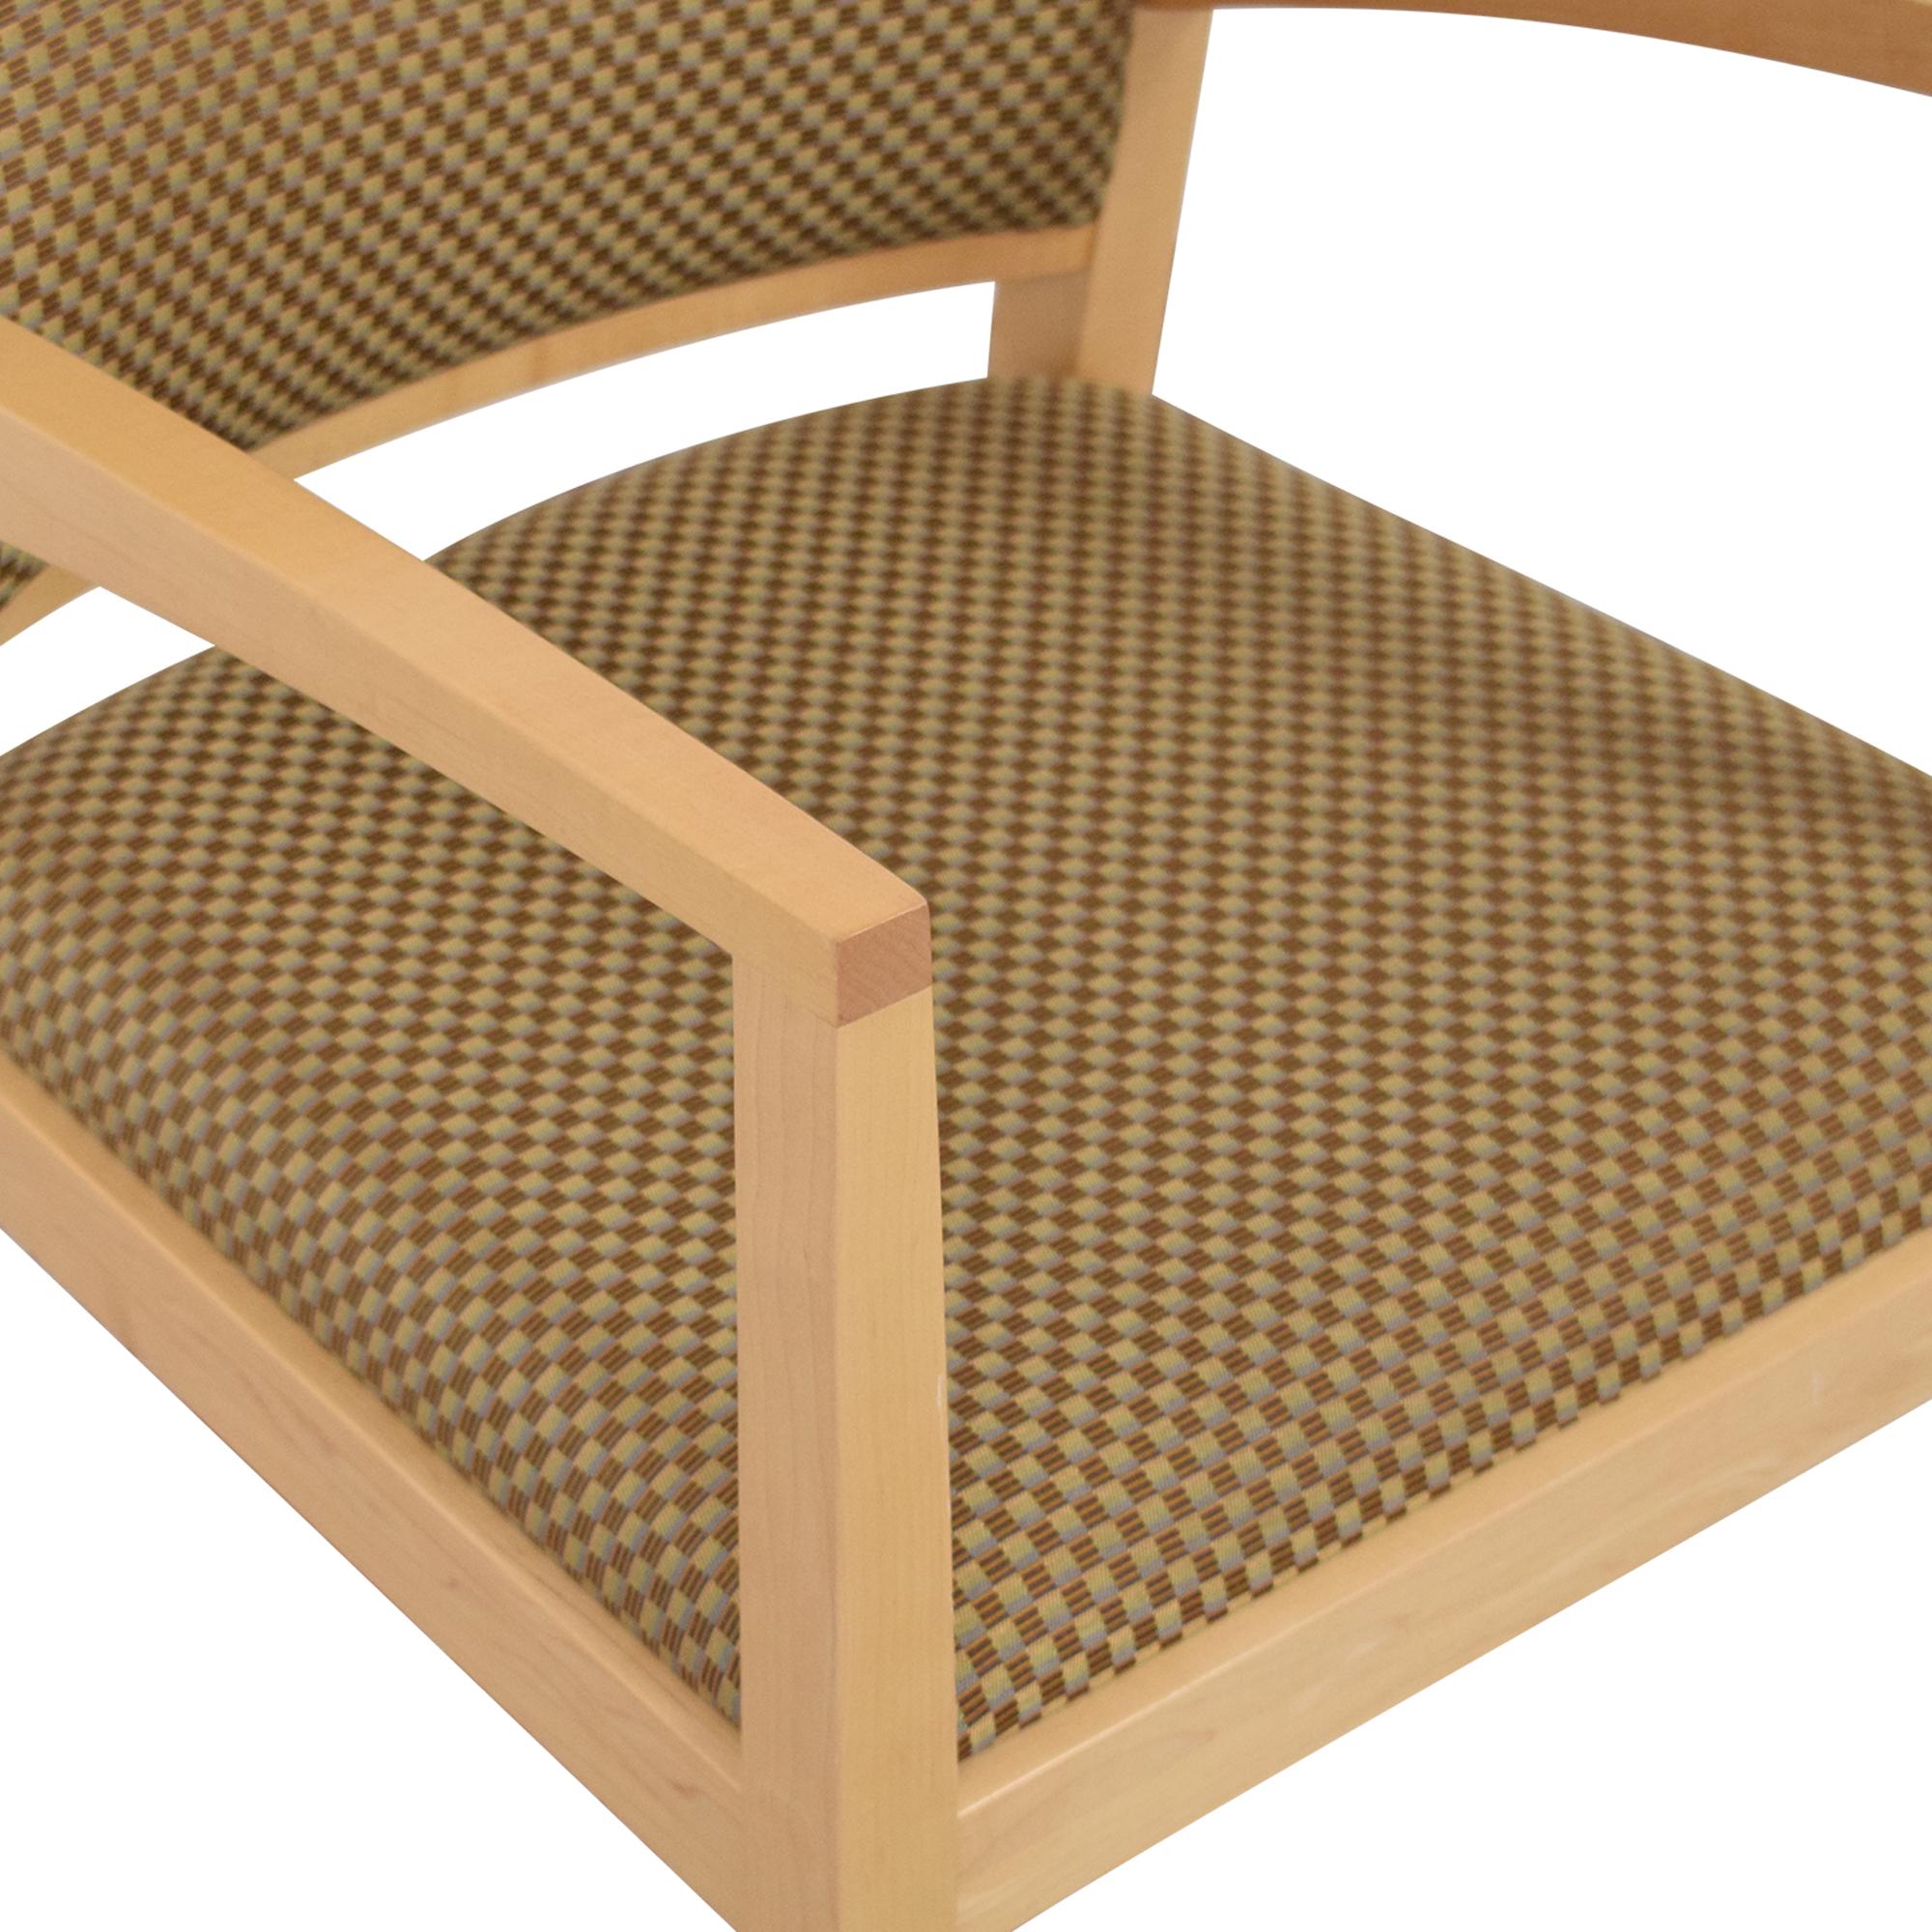 Krug Krug Cadence Guest Chair dimensions